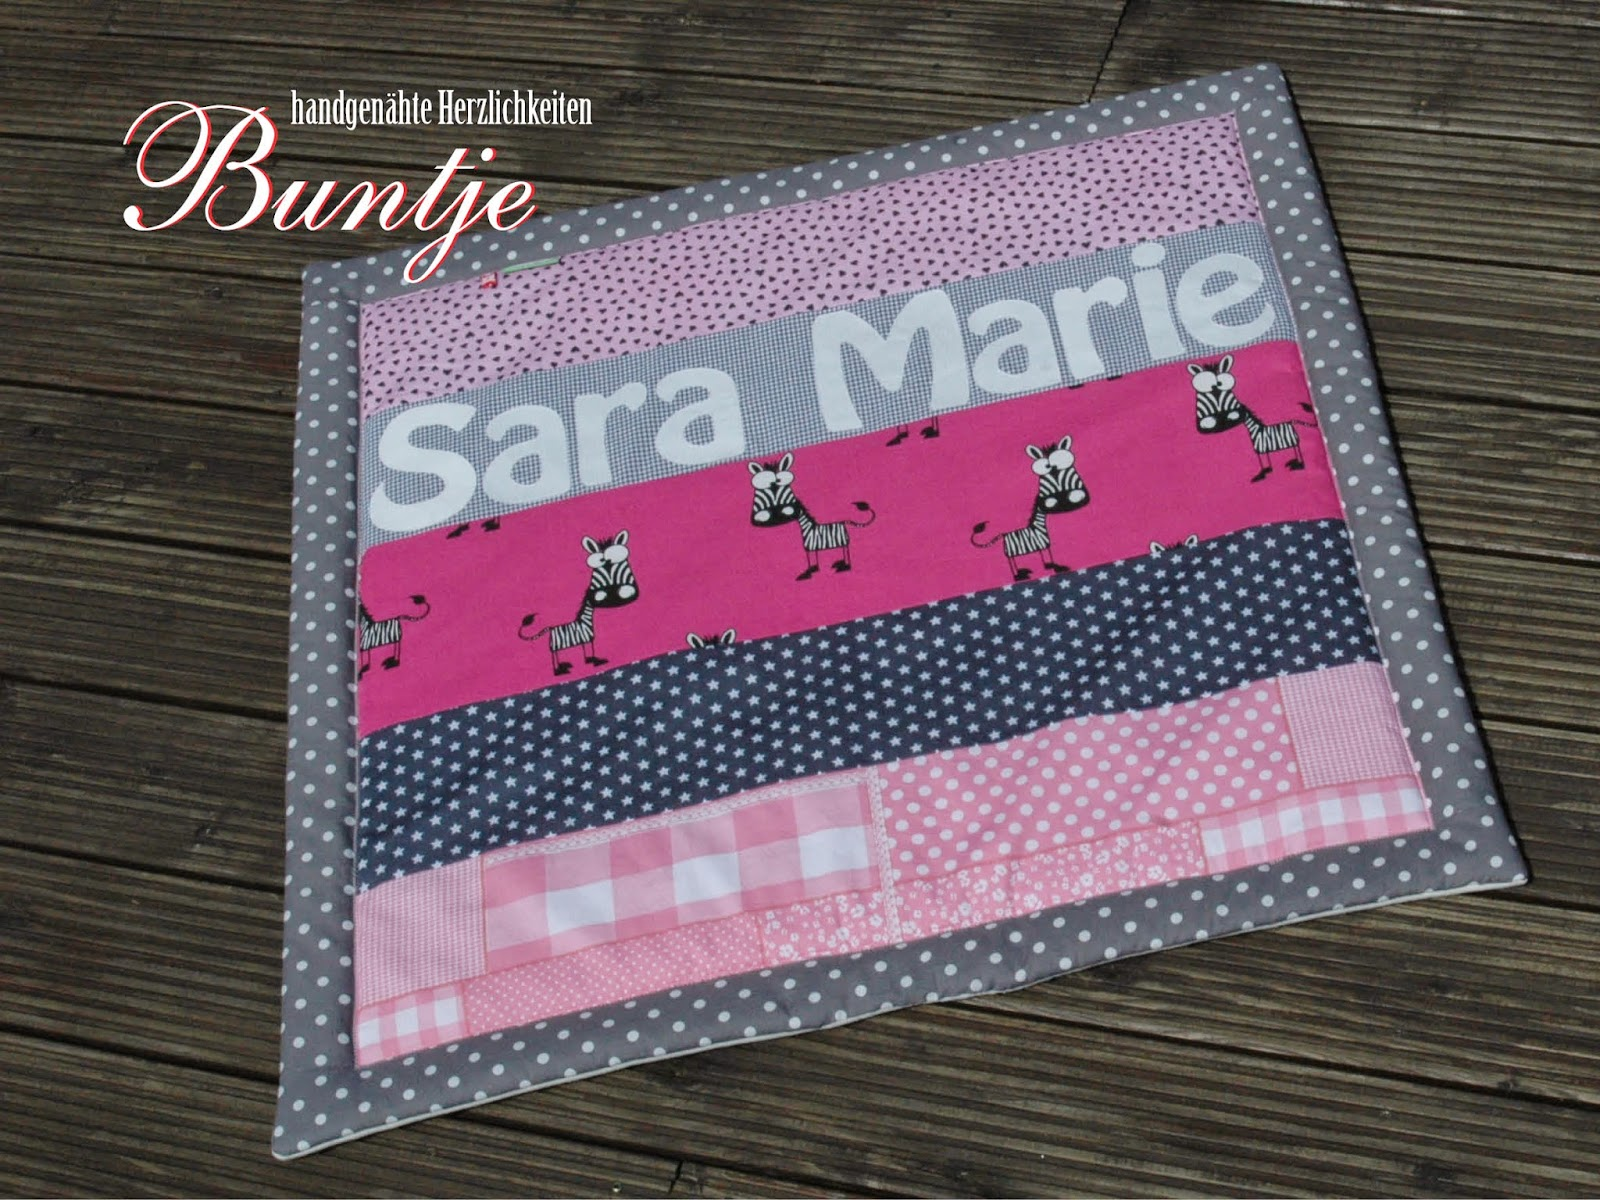 Krabbeldecke Kuscheldecke Decke Baby Name Mädchen Sarah Marie rosa pink grau Zebra Afrika Dschungel Geschenk Geburt Taufe Baumwolle Fleece Buntje nähen